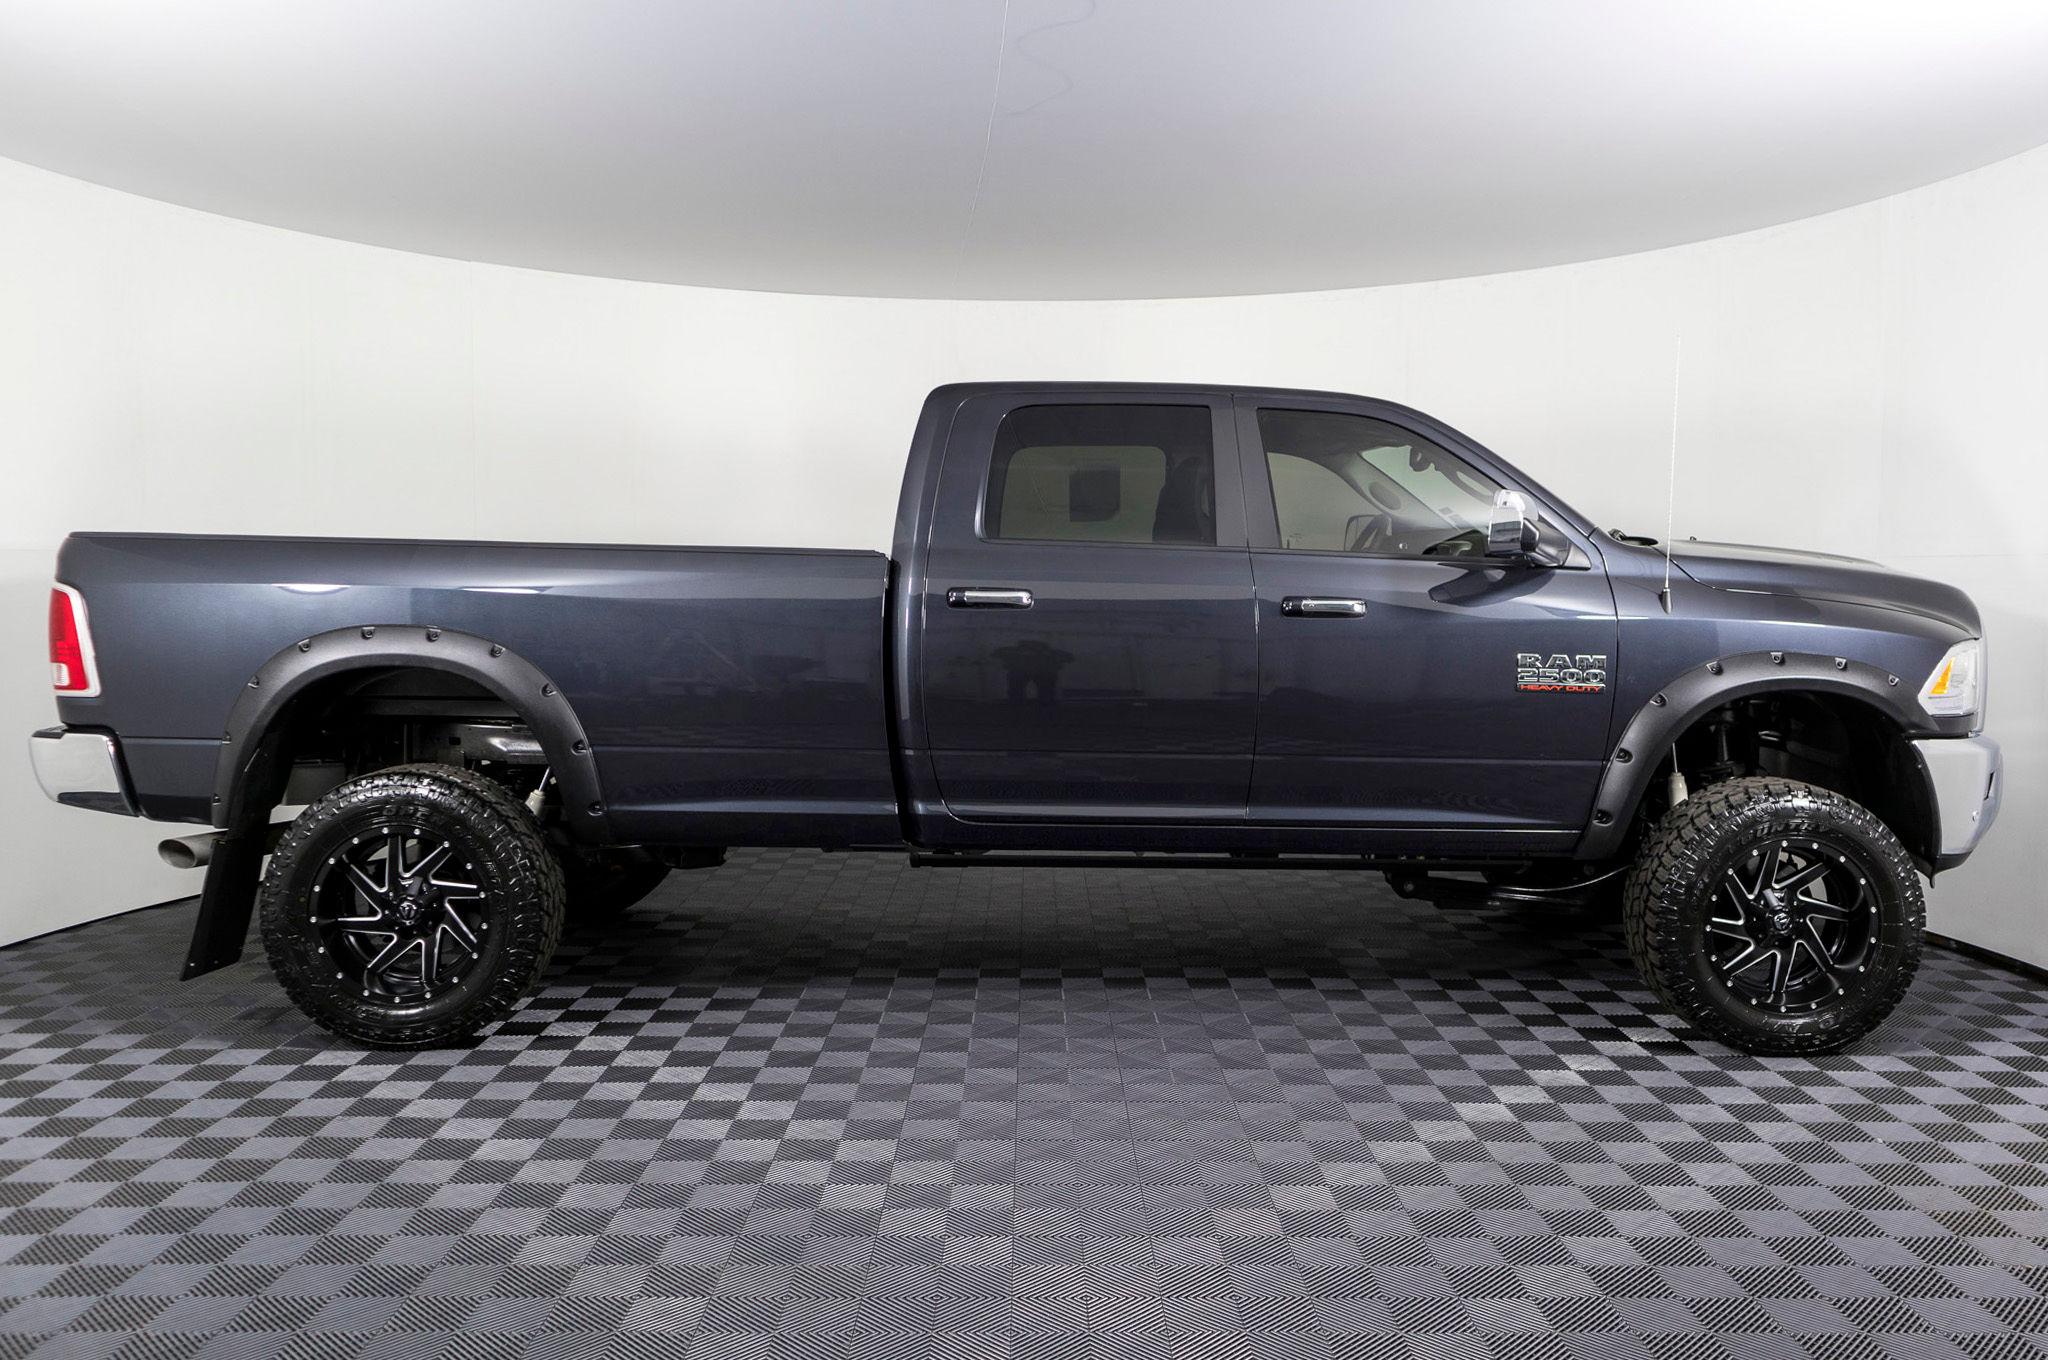 Used Lifted 2018 Dodge Ram 2500 Laramie 4x4 Diesel Truck For Sale Northwest Motorsport